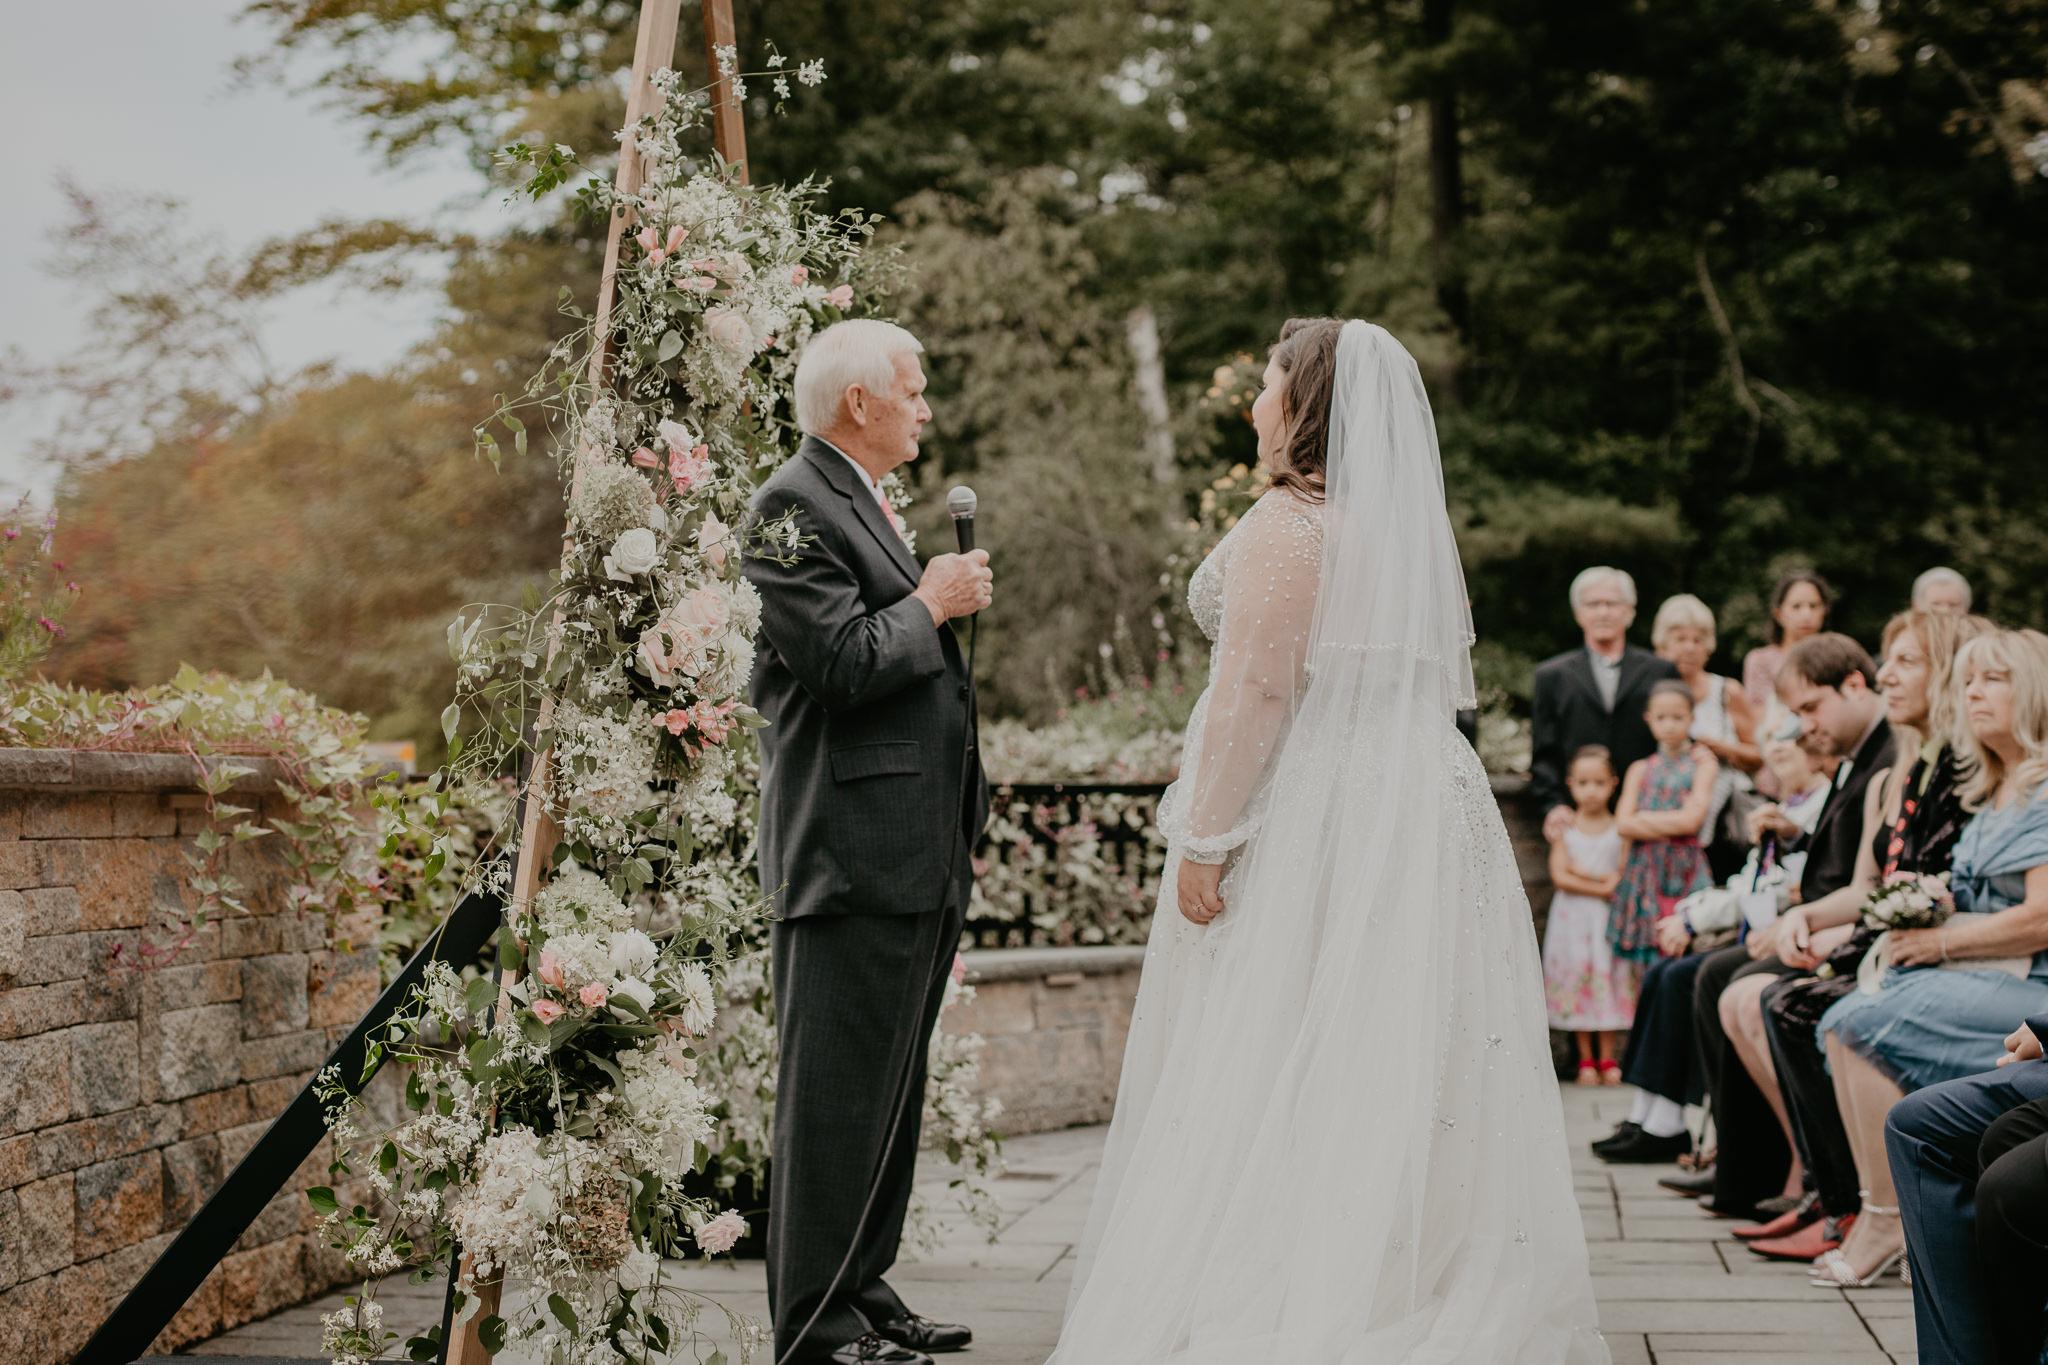 H+A_Hartford_Connecticut_RoseGarden_Wedding023.jpg